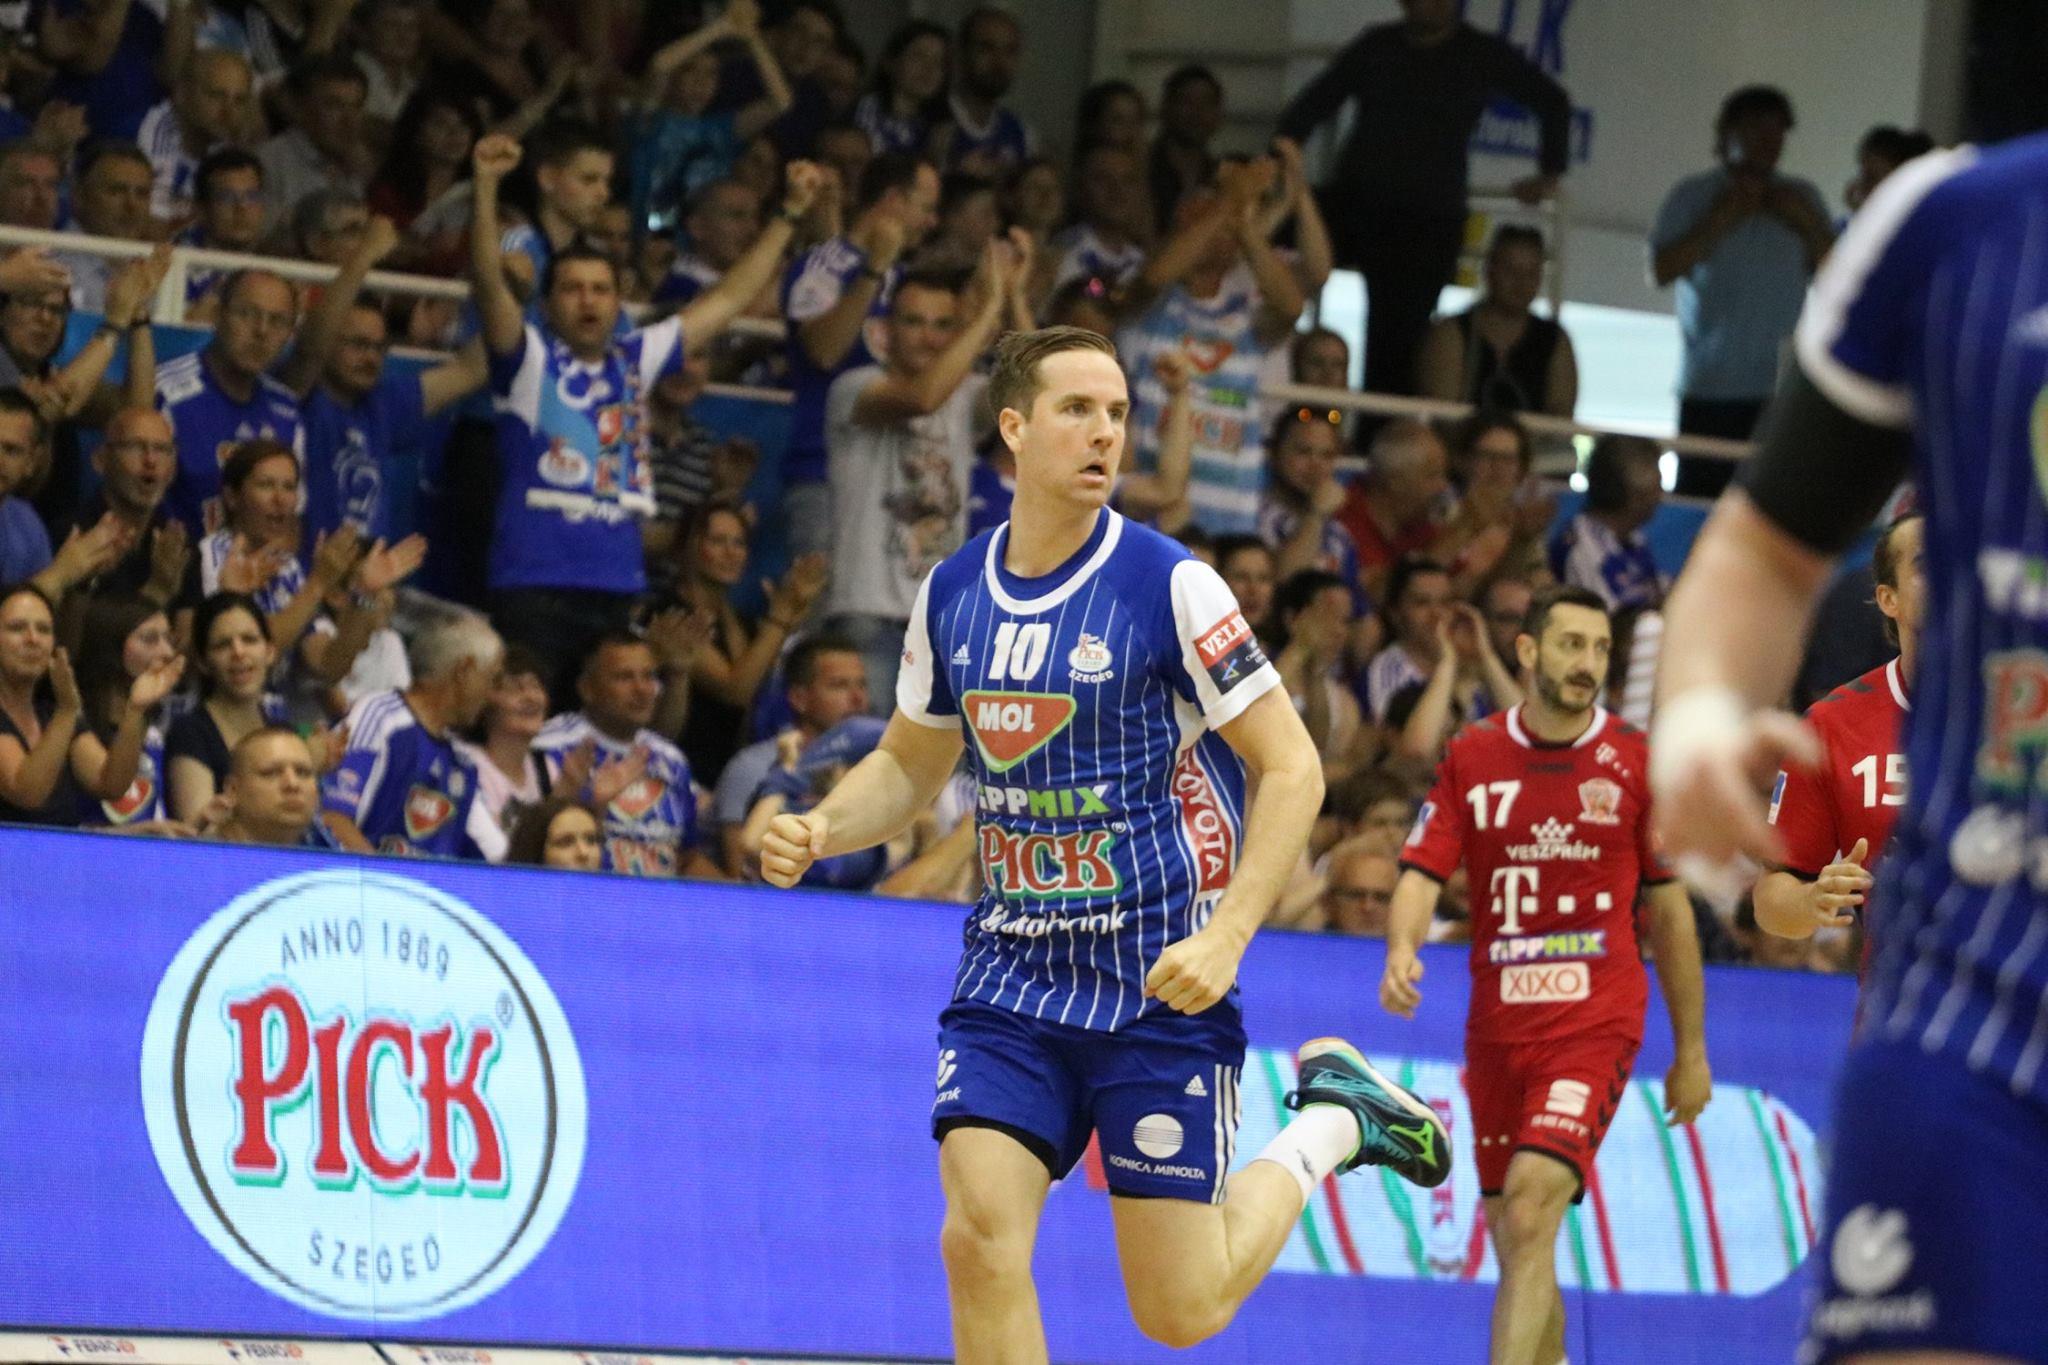 Stefán Sigurmannsson 2021-ig hosszabbított